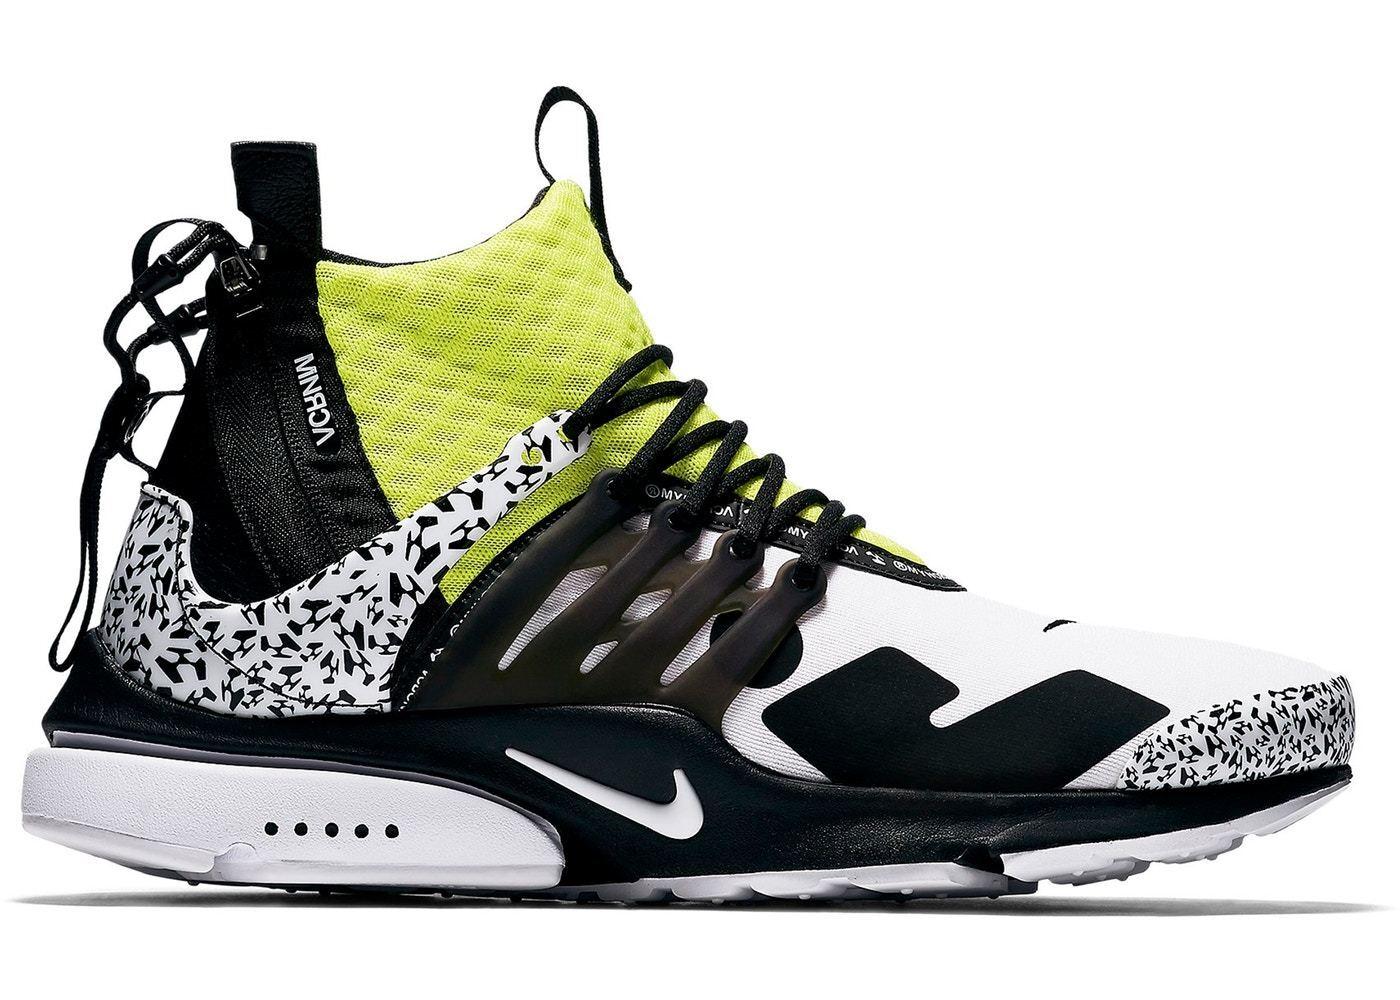 Nike lunaepic flyknit oreo da uomini scarpe da oreo corsa 843764 001 numero 11 ae7a6e